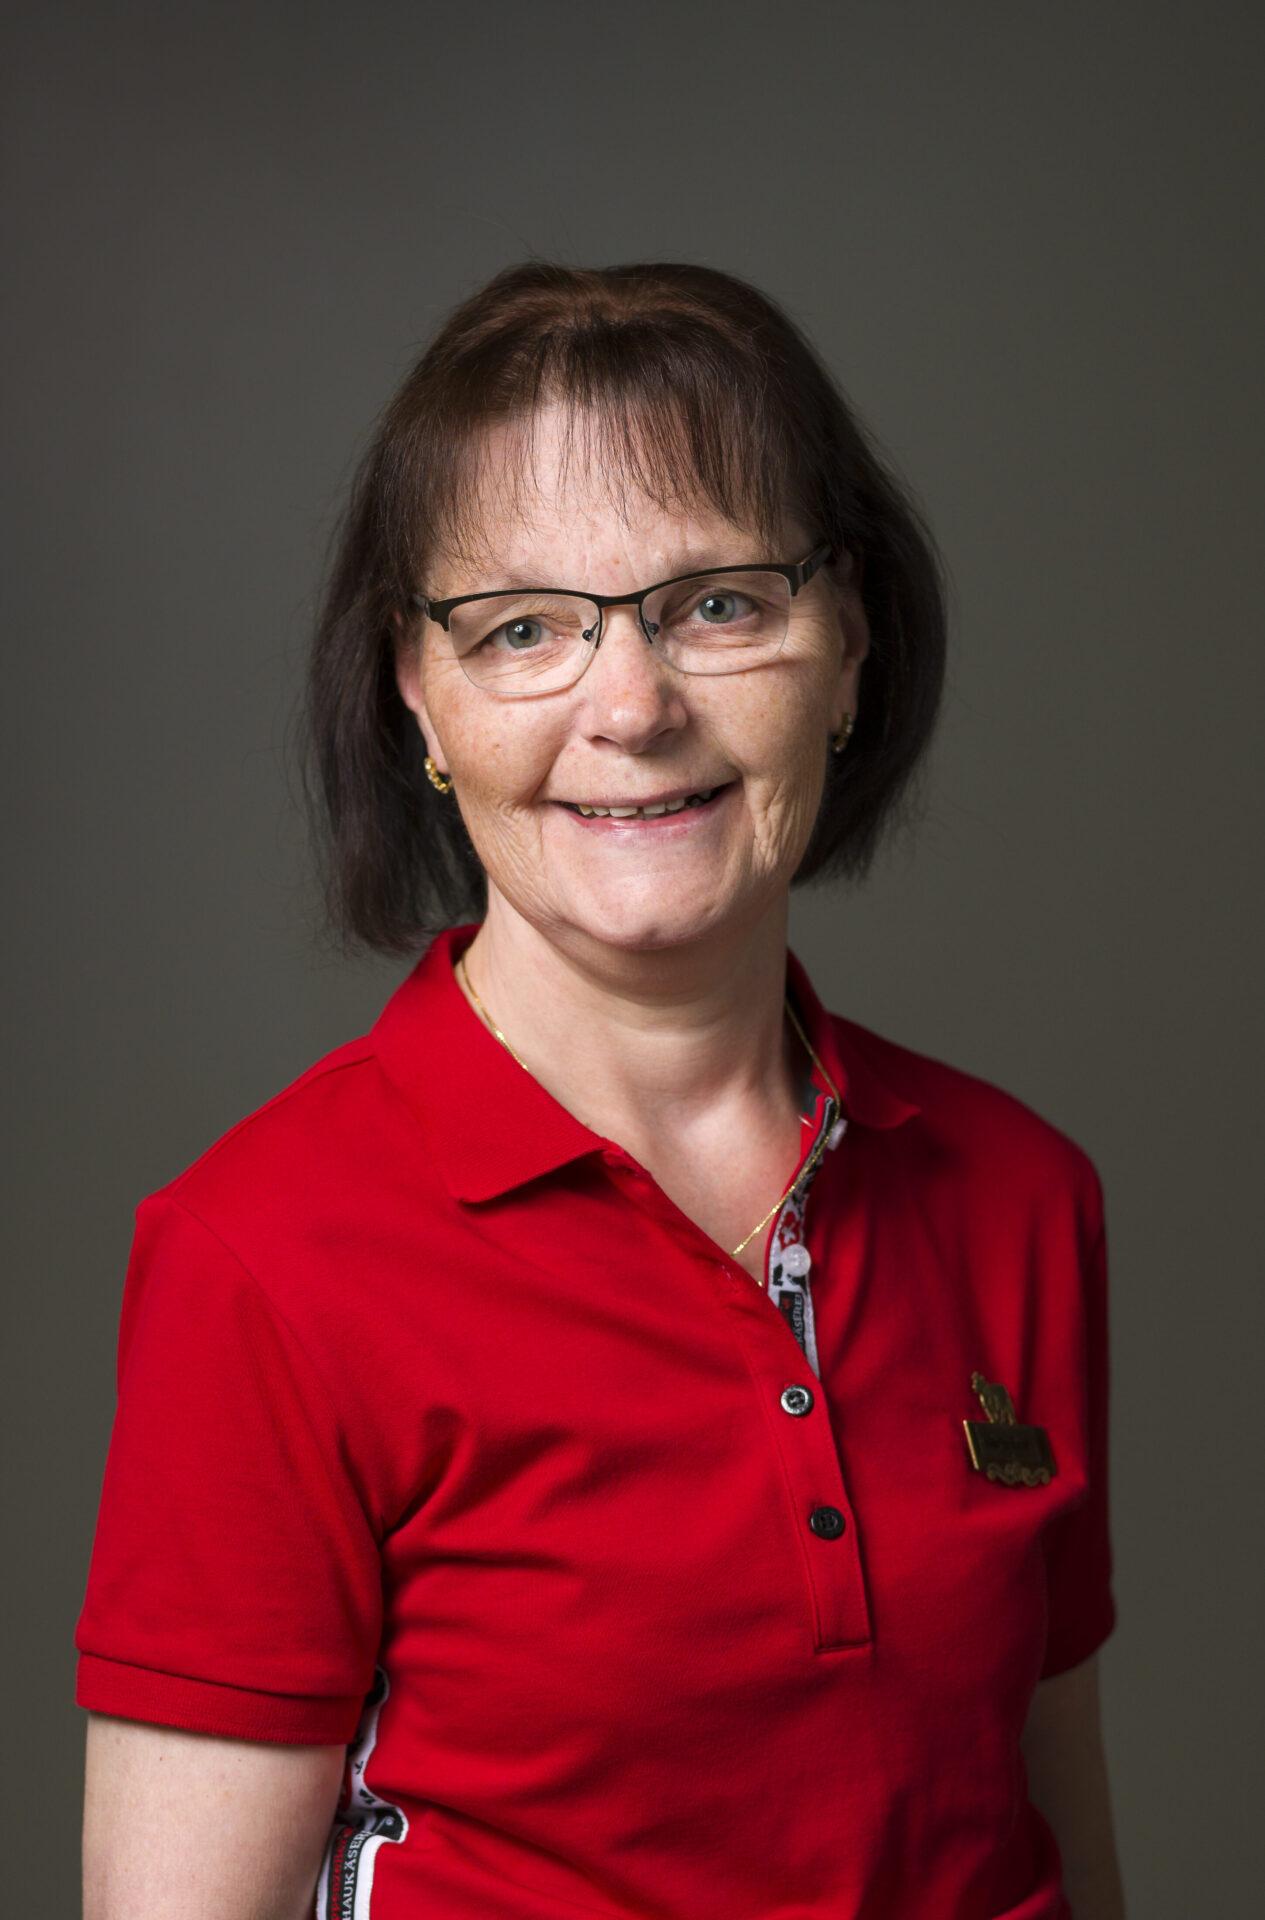 Maria Erni, Service